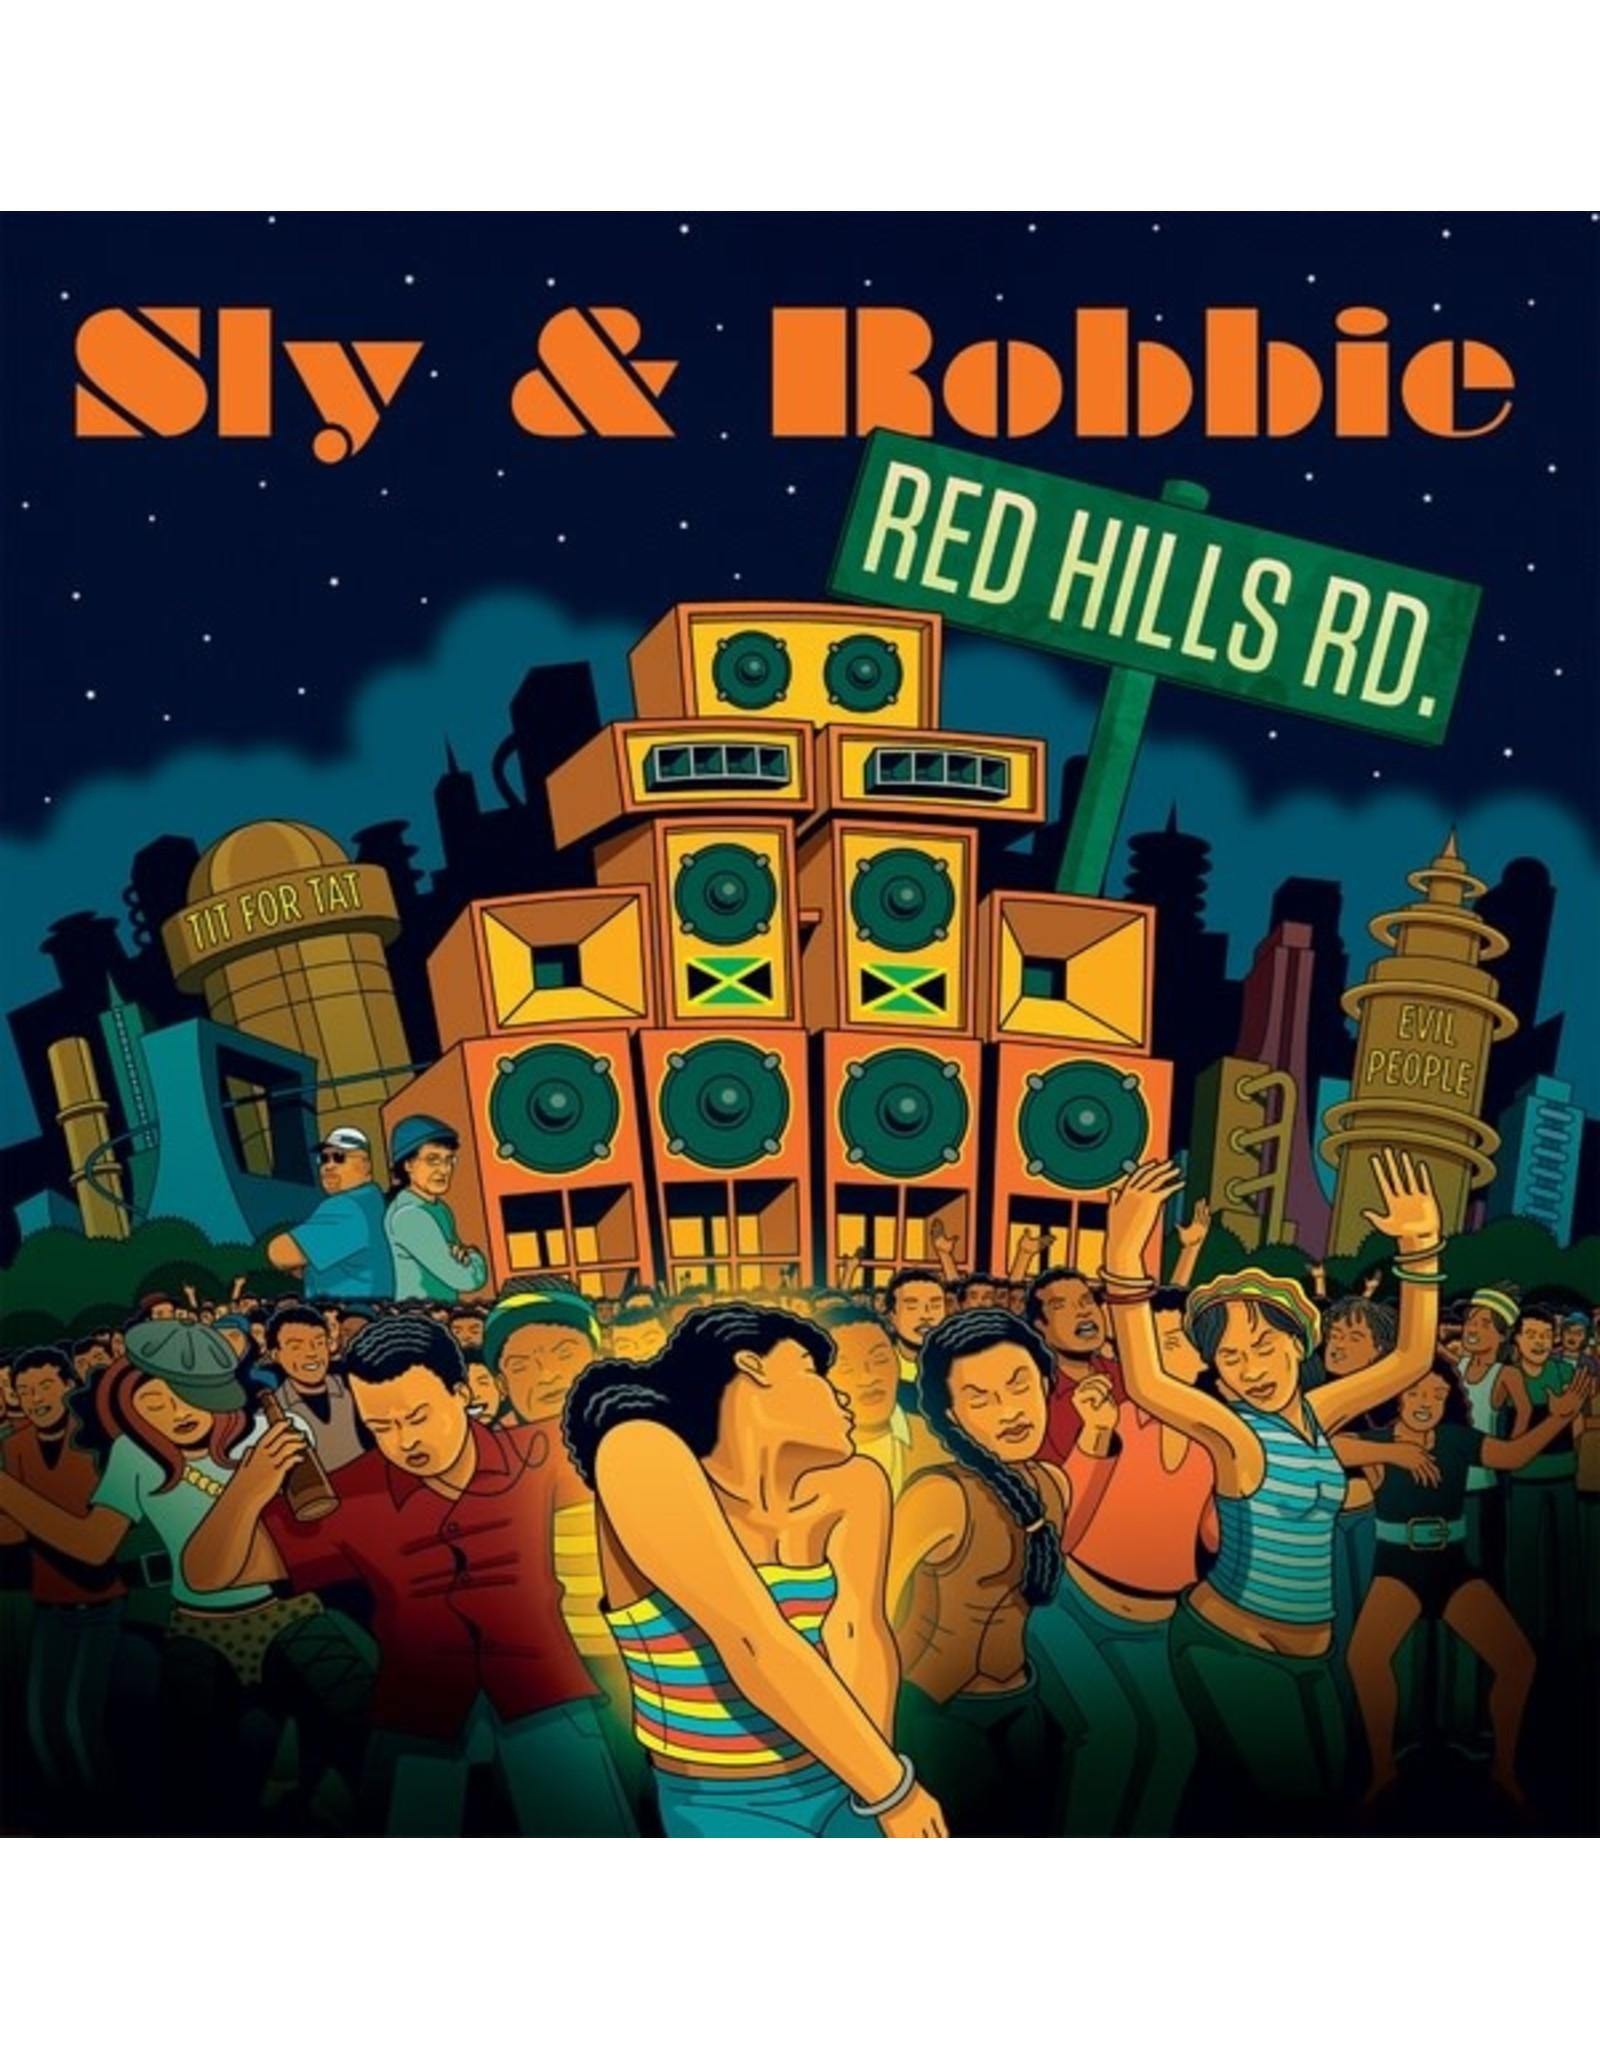 New Vinyl Sly & Robbie - Red Hills Rd. LP